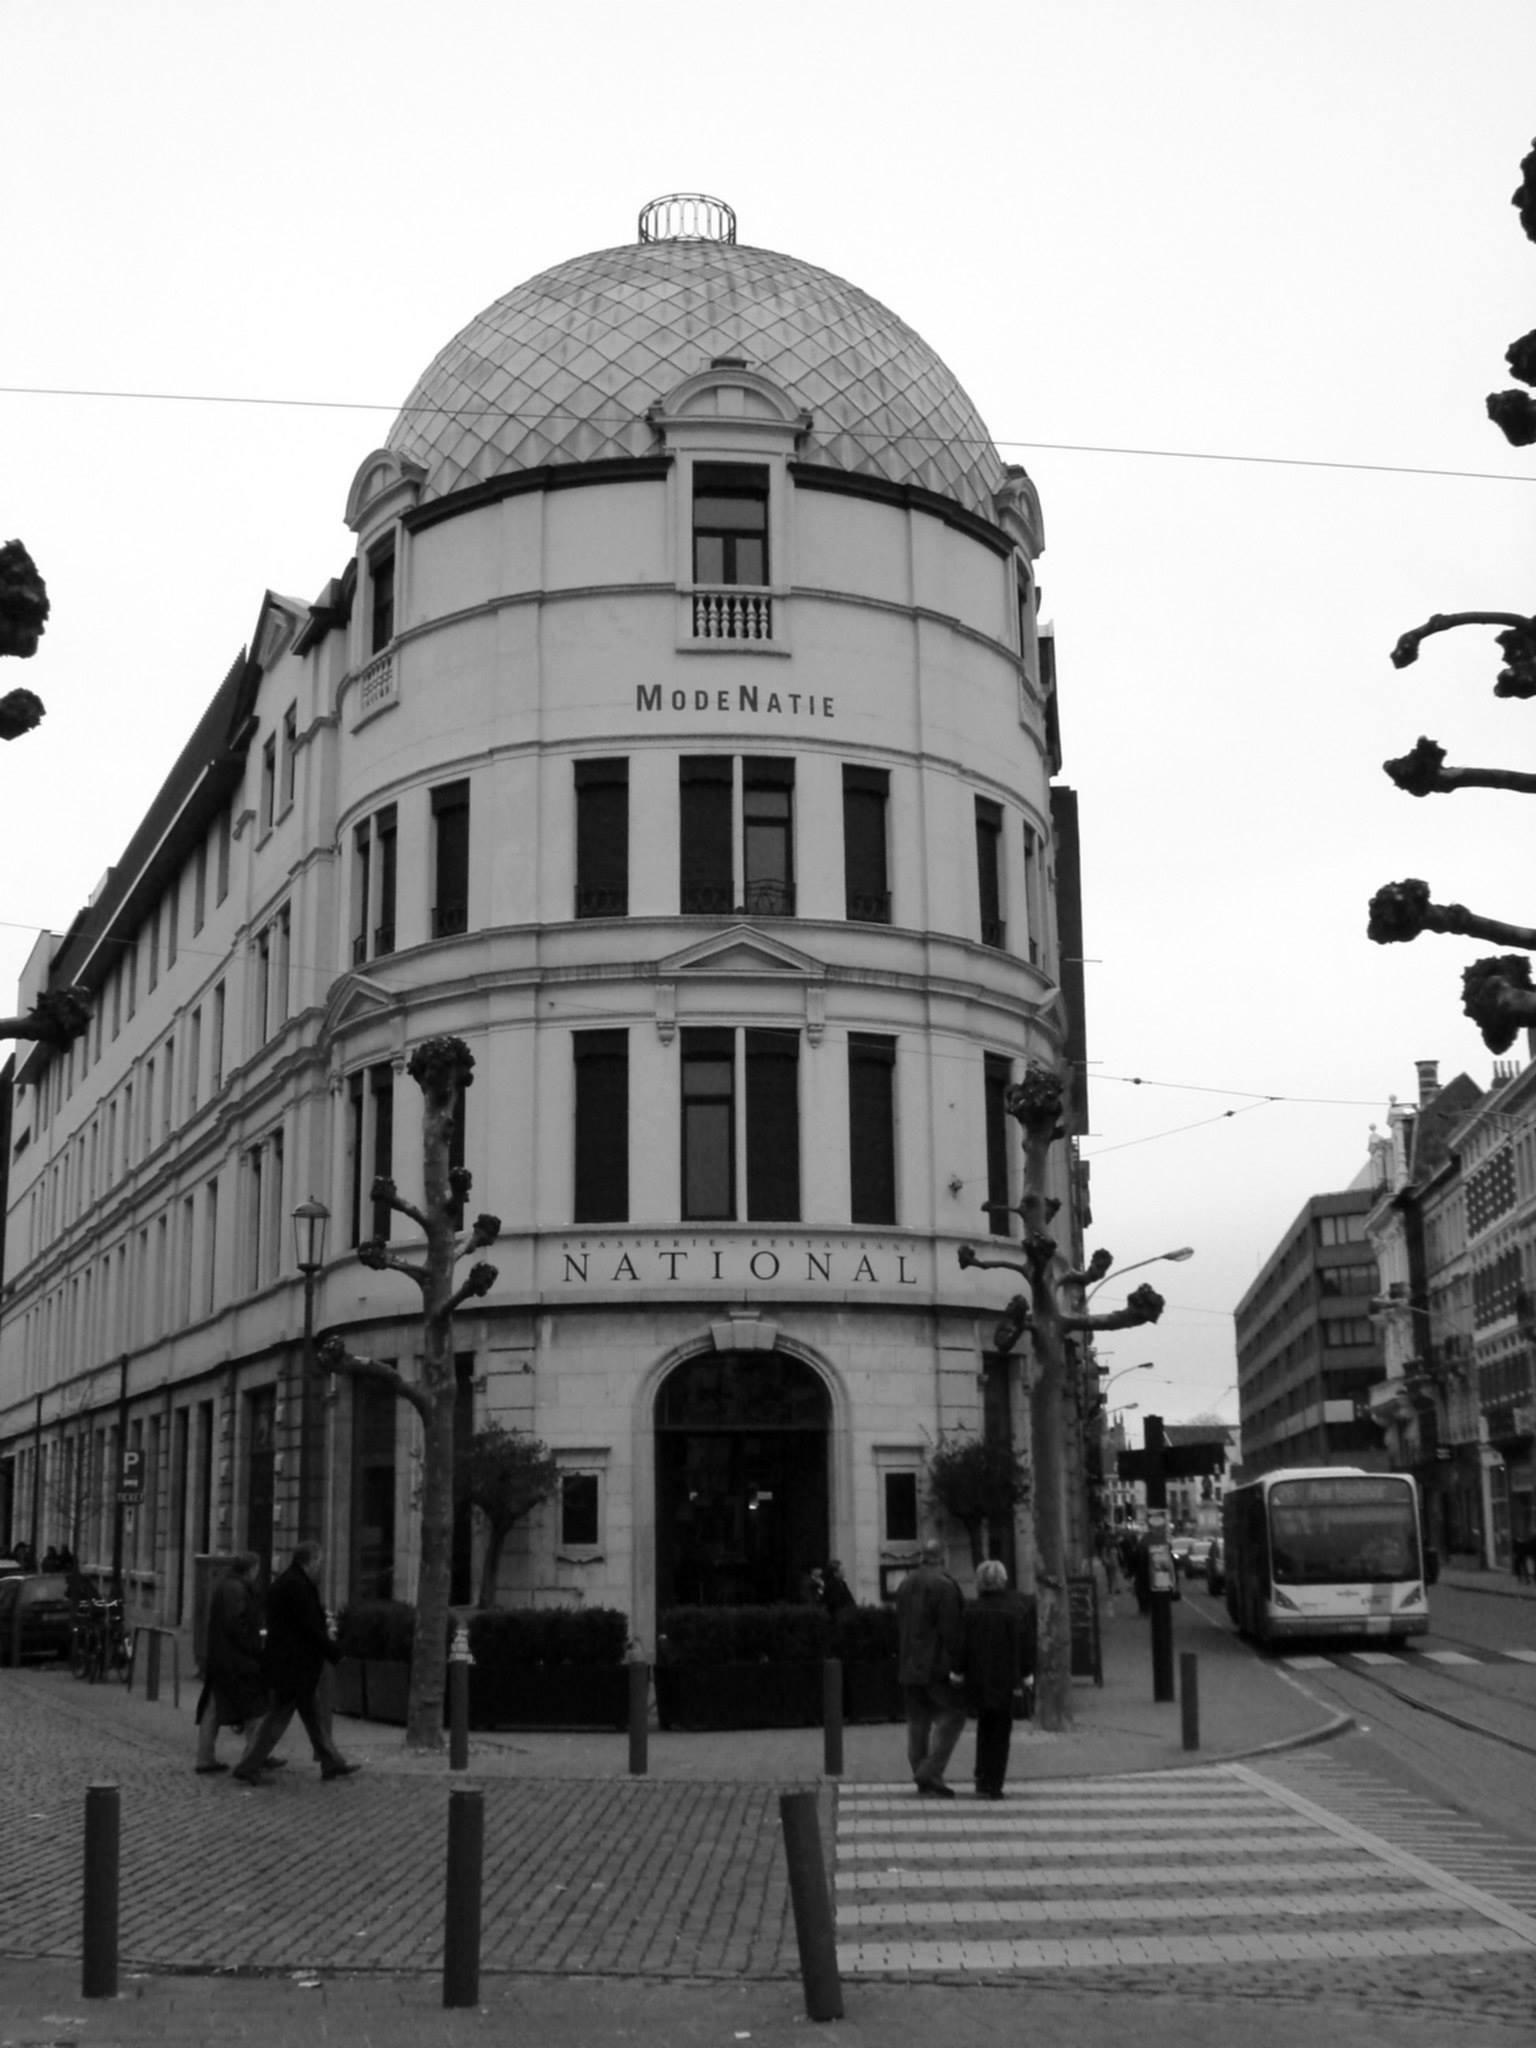 Antwerp, Belgium Antwerp Mode Museum building in the mode district of the city by Rosario Di Rubbo